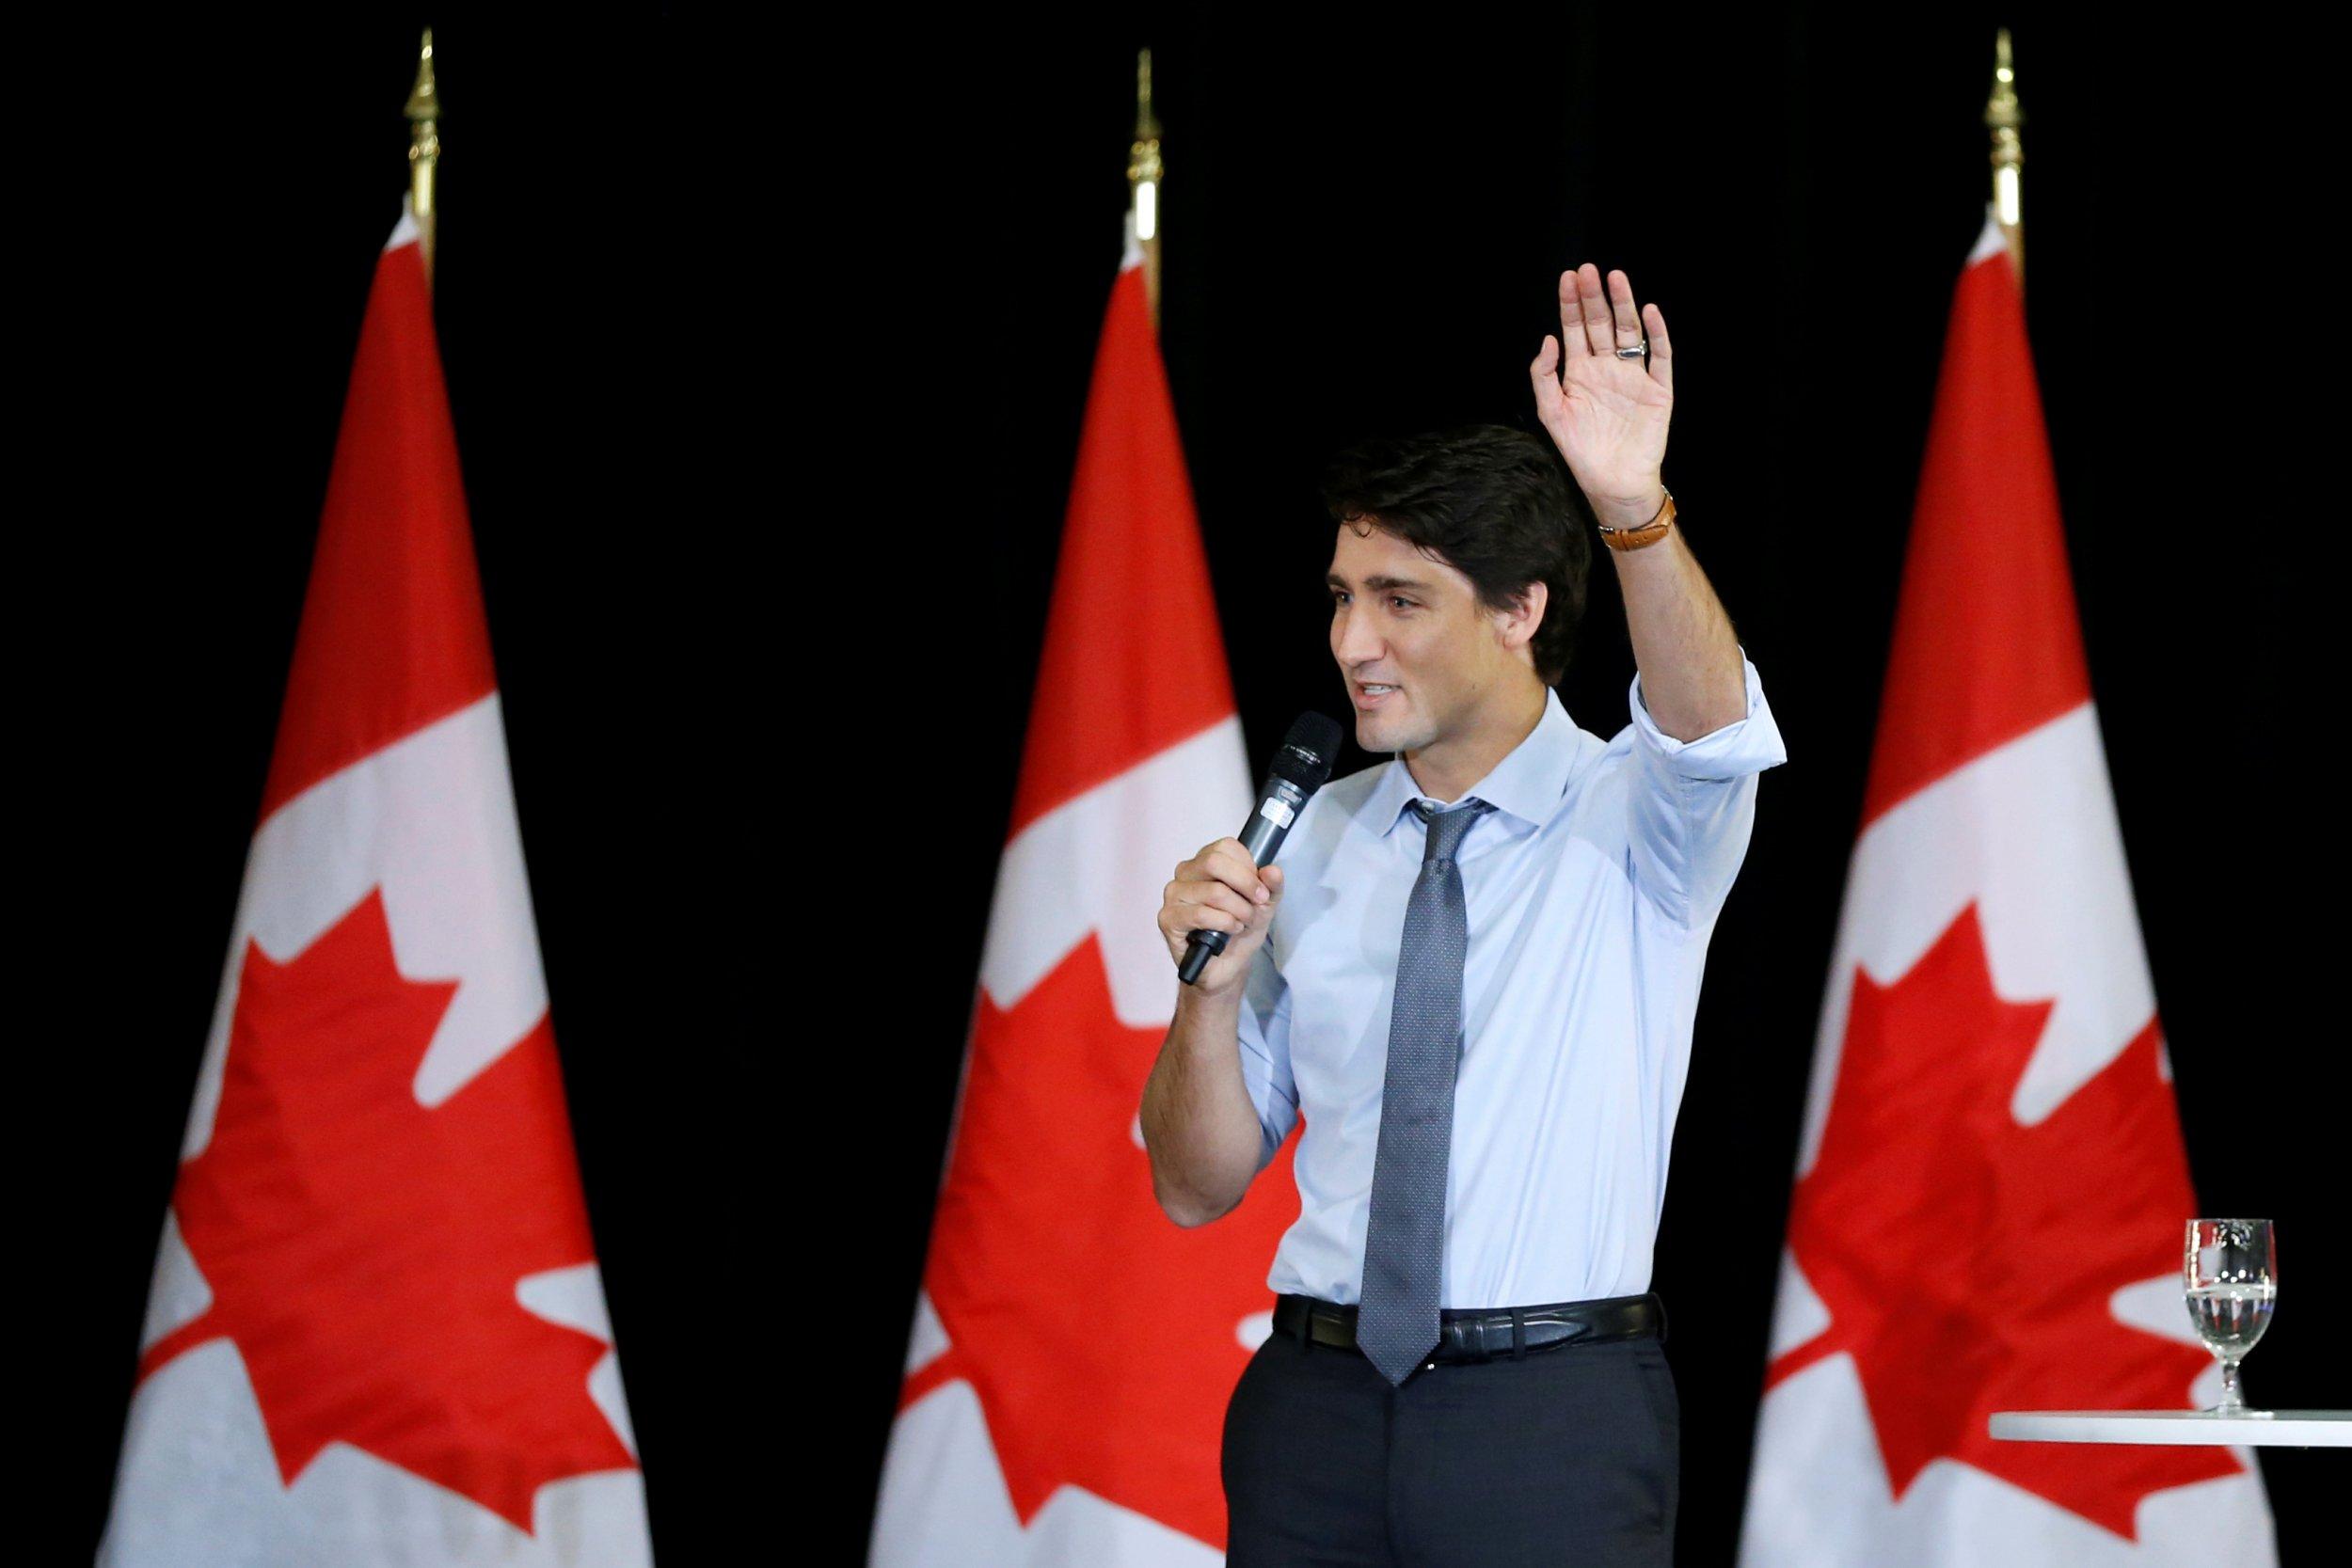 0213_Trump_Trudeau_pressser_01